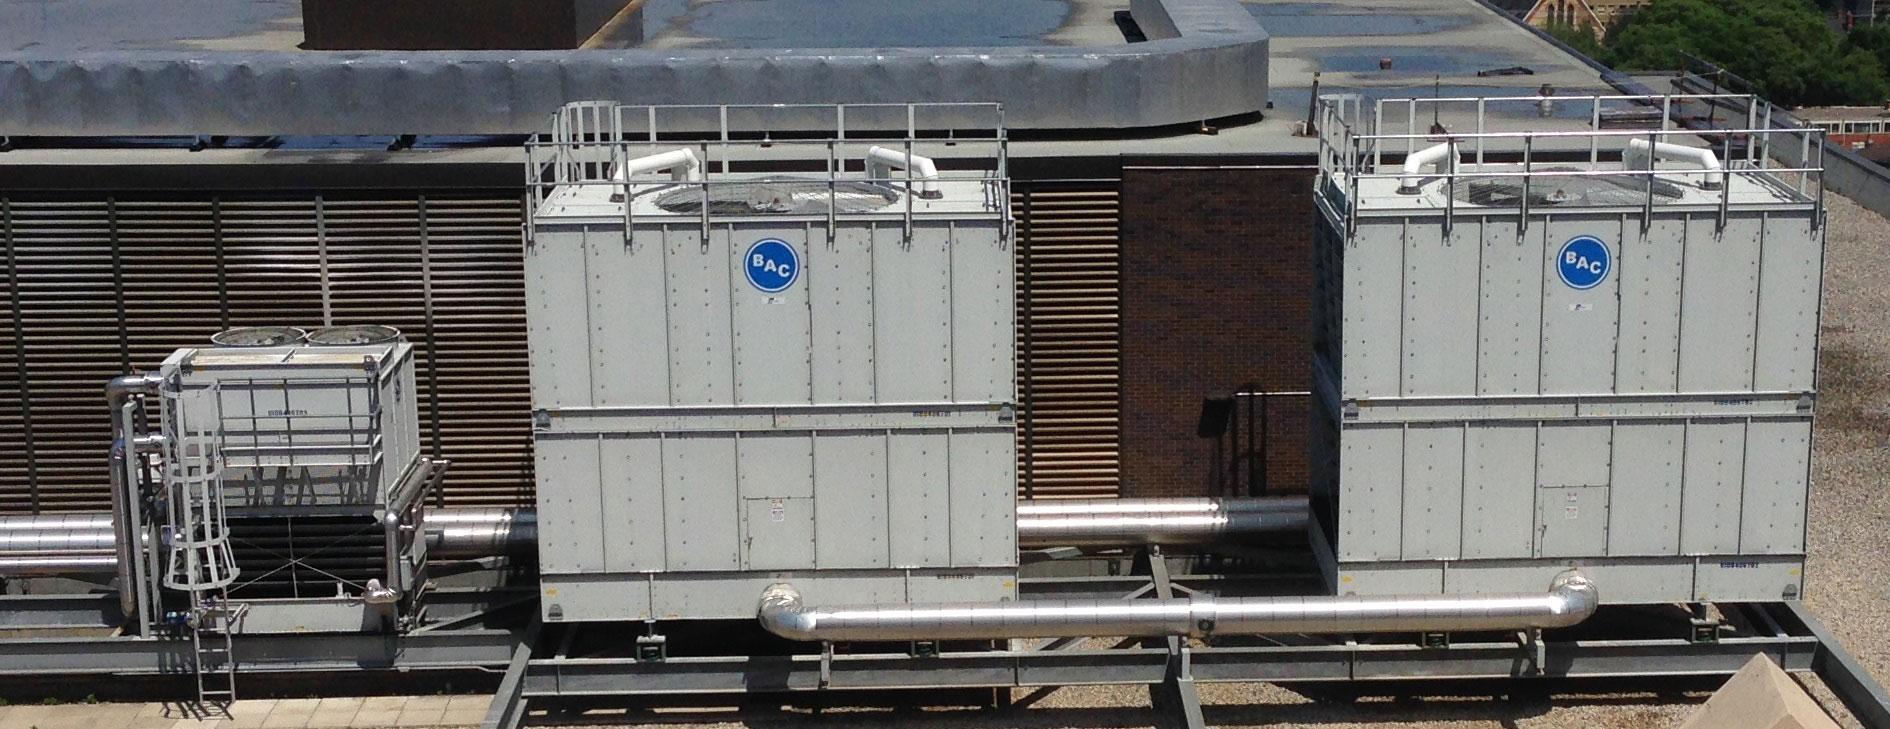 Cooling Tower Maintenance Toronto, Markham, Vaughan, Newmarket